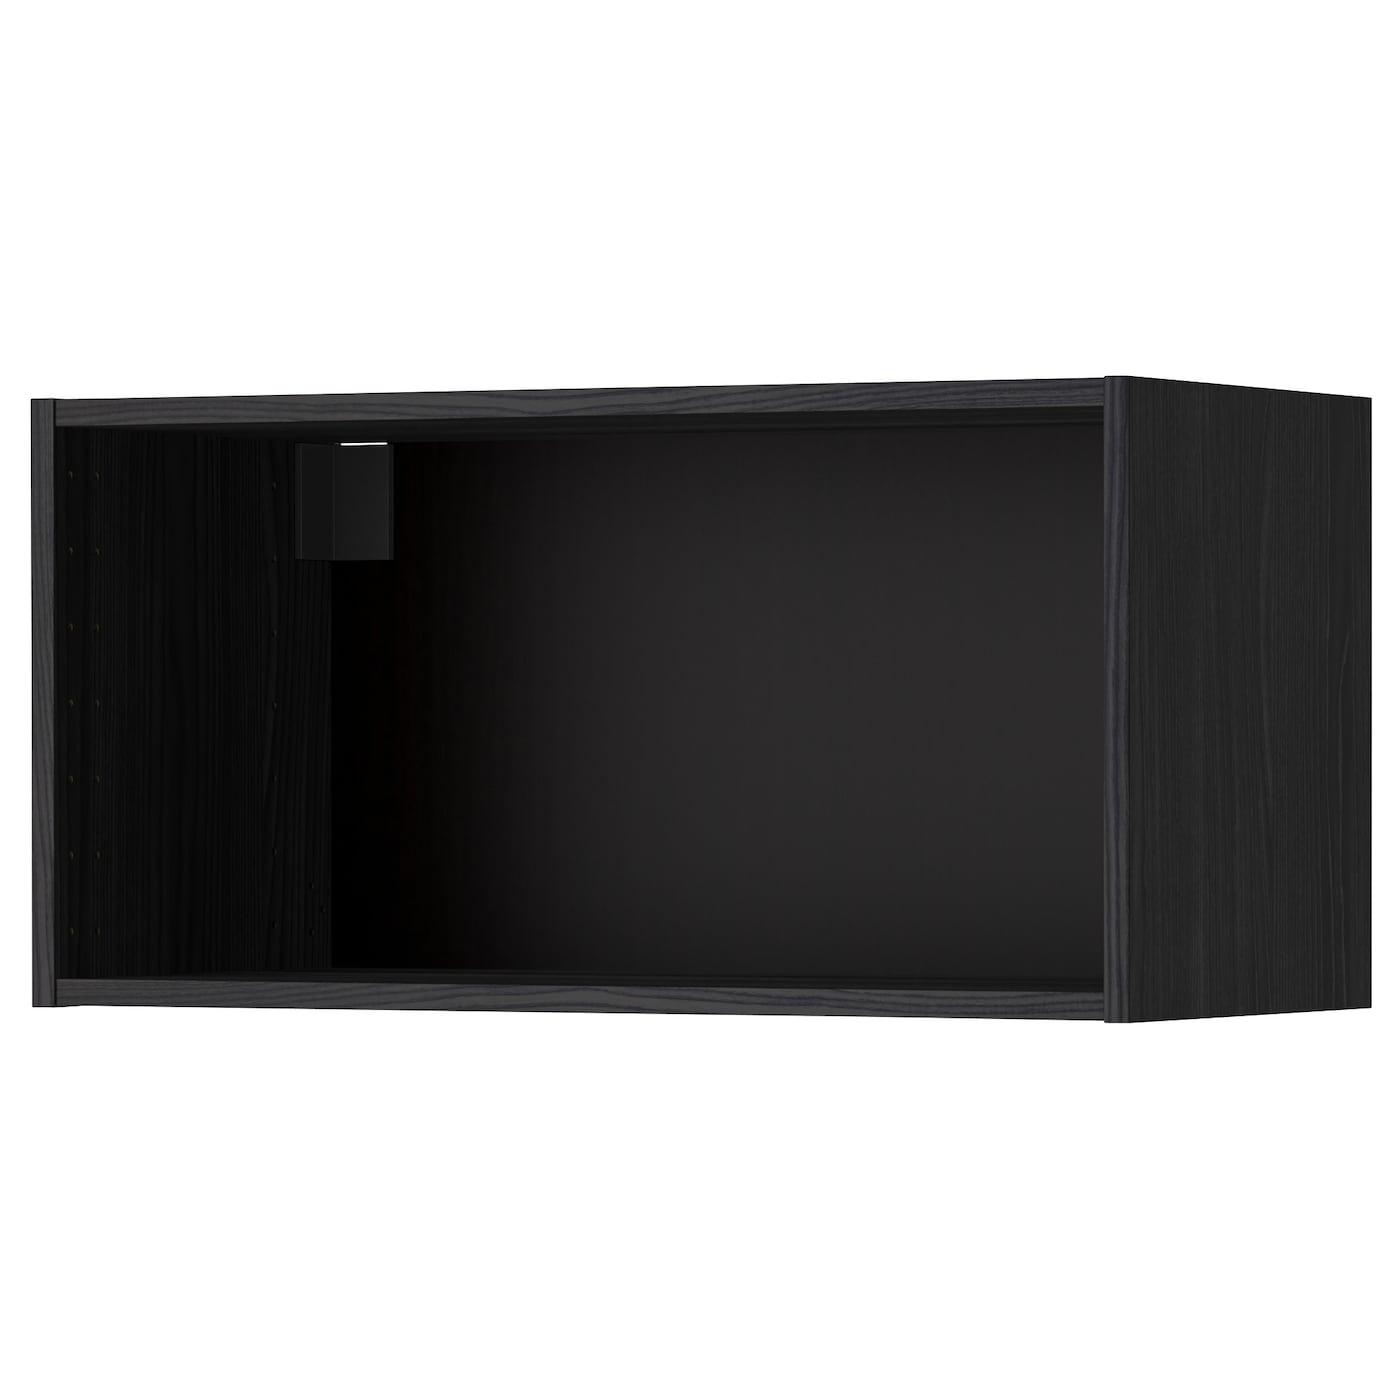 METOD, Korpus Wandschrank, Holzeffekt schwarz, schwarz 002.055.44